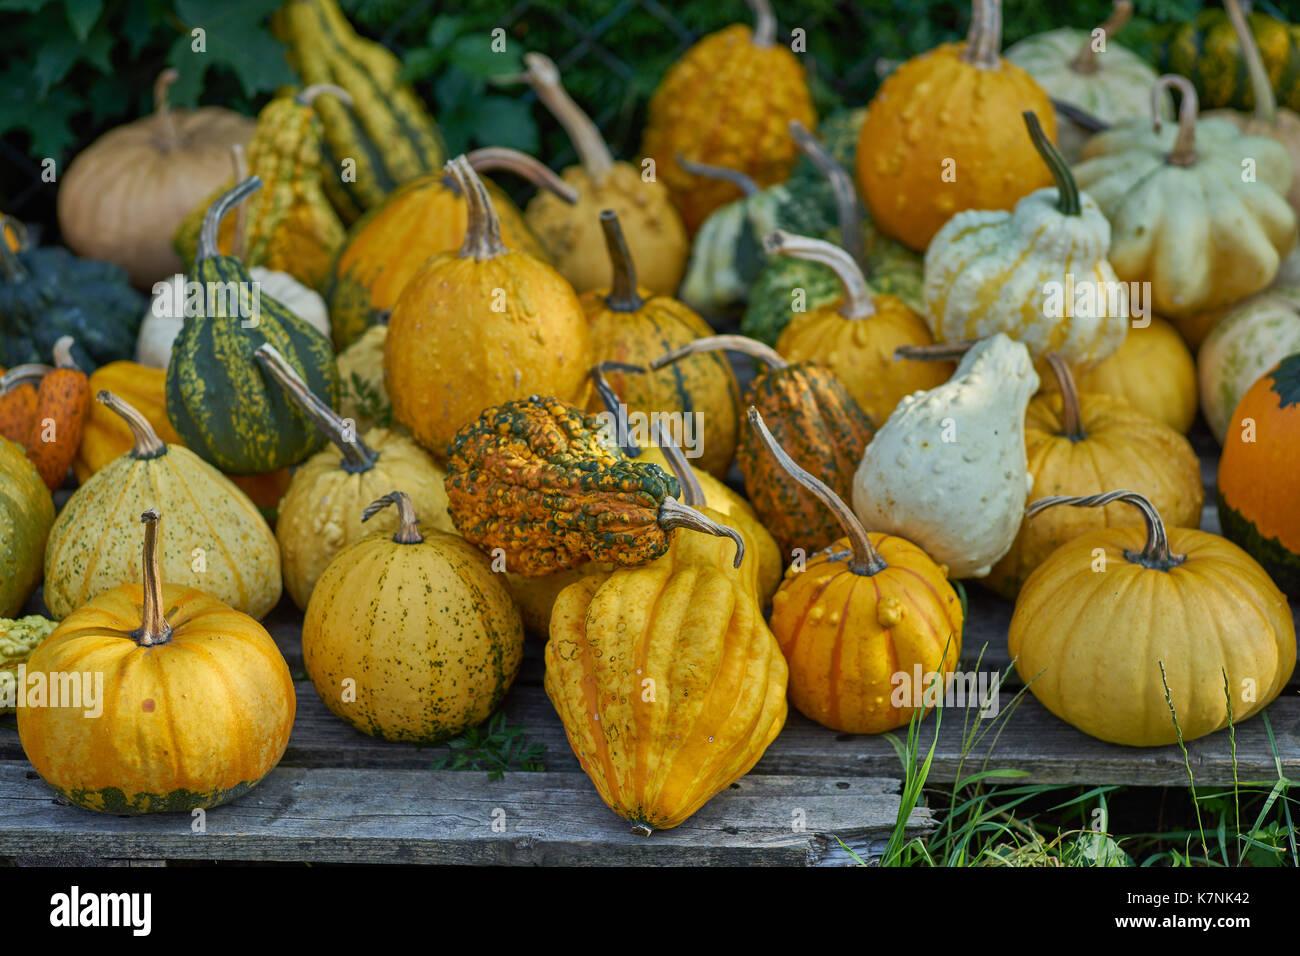 many multicolor pumpkins many multi-shaped pumpkins many colorful pumpkins Stock Photo